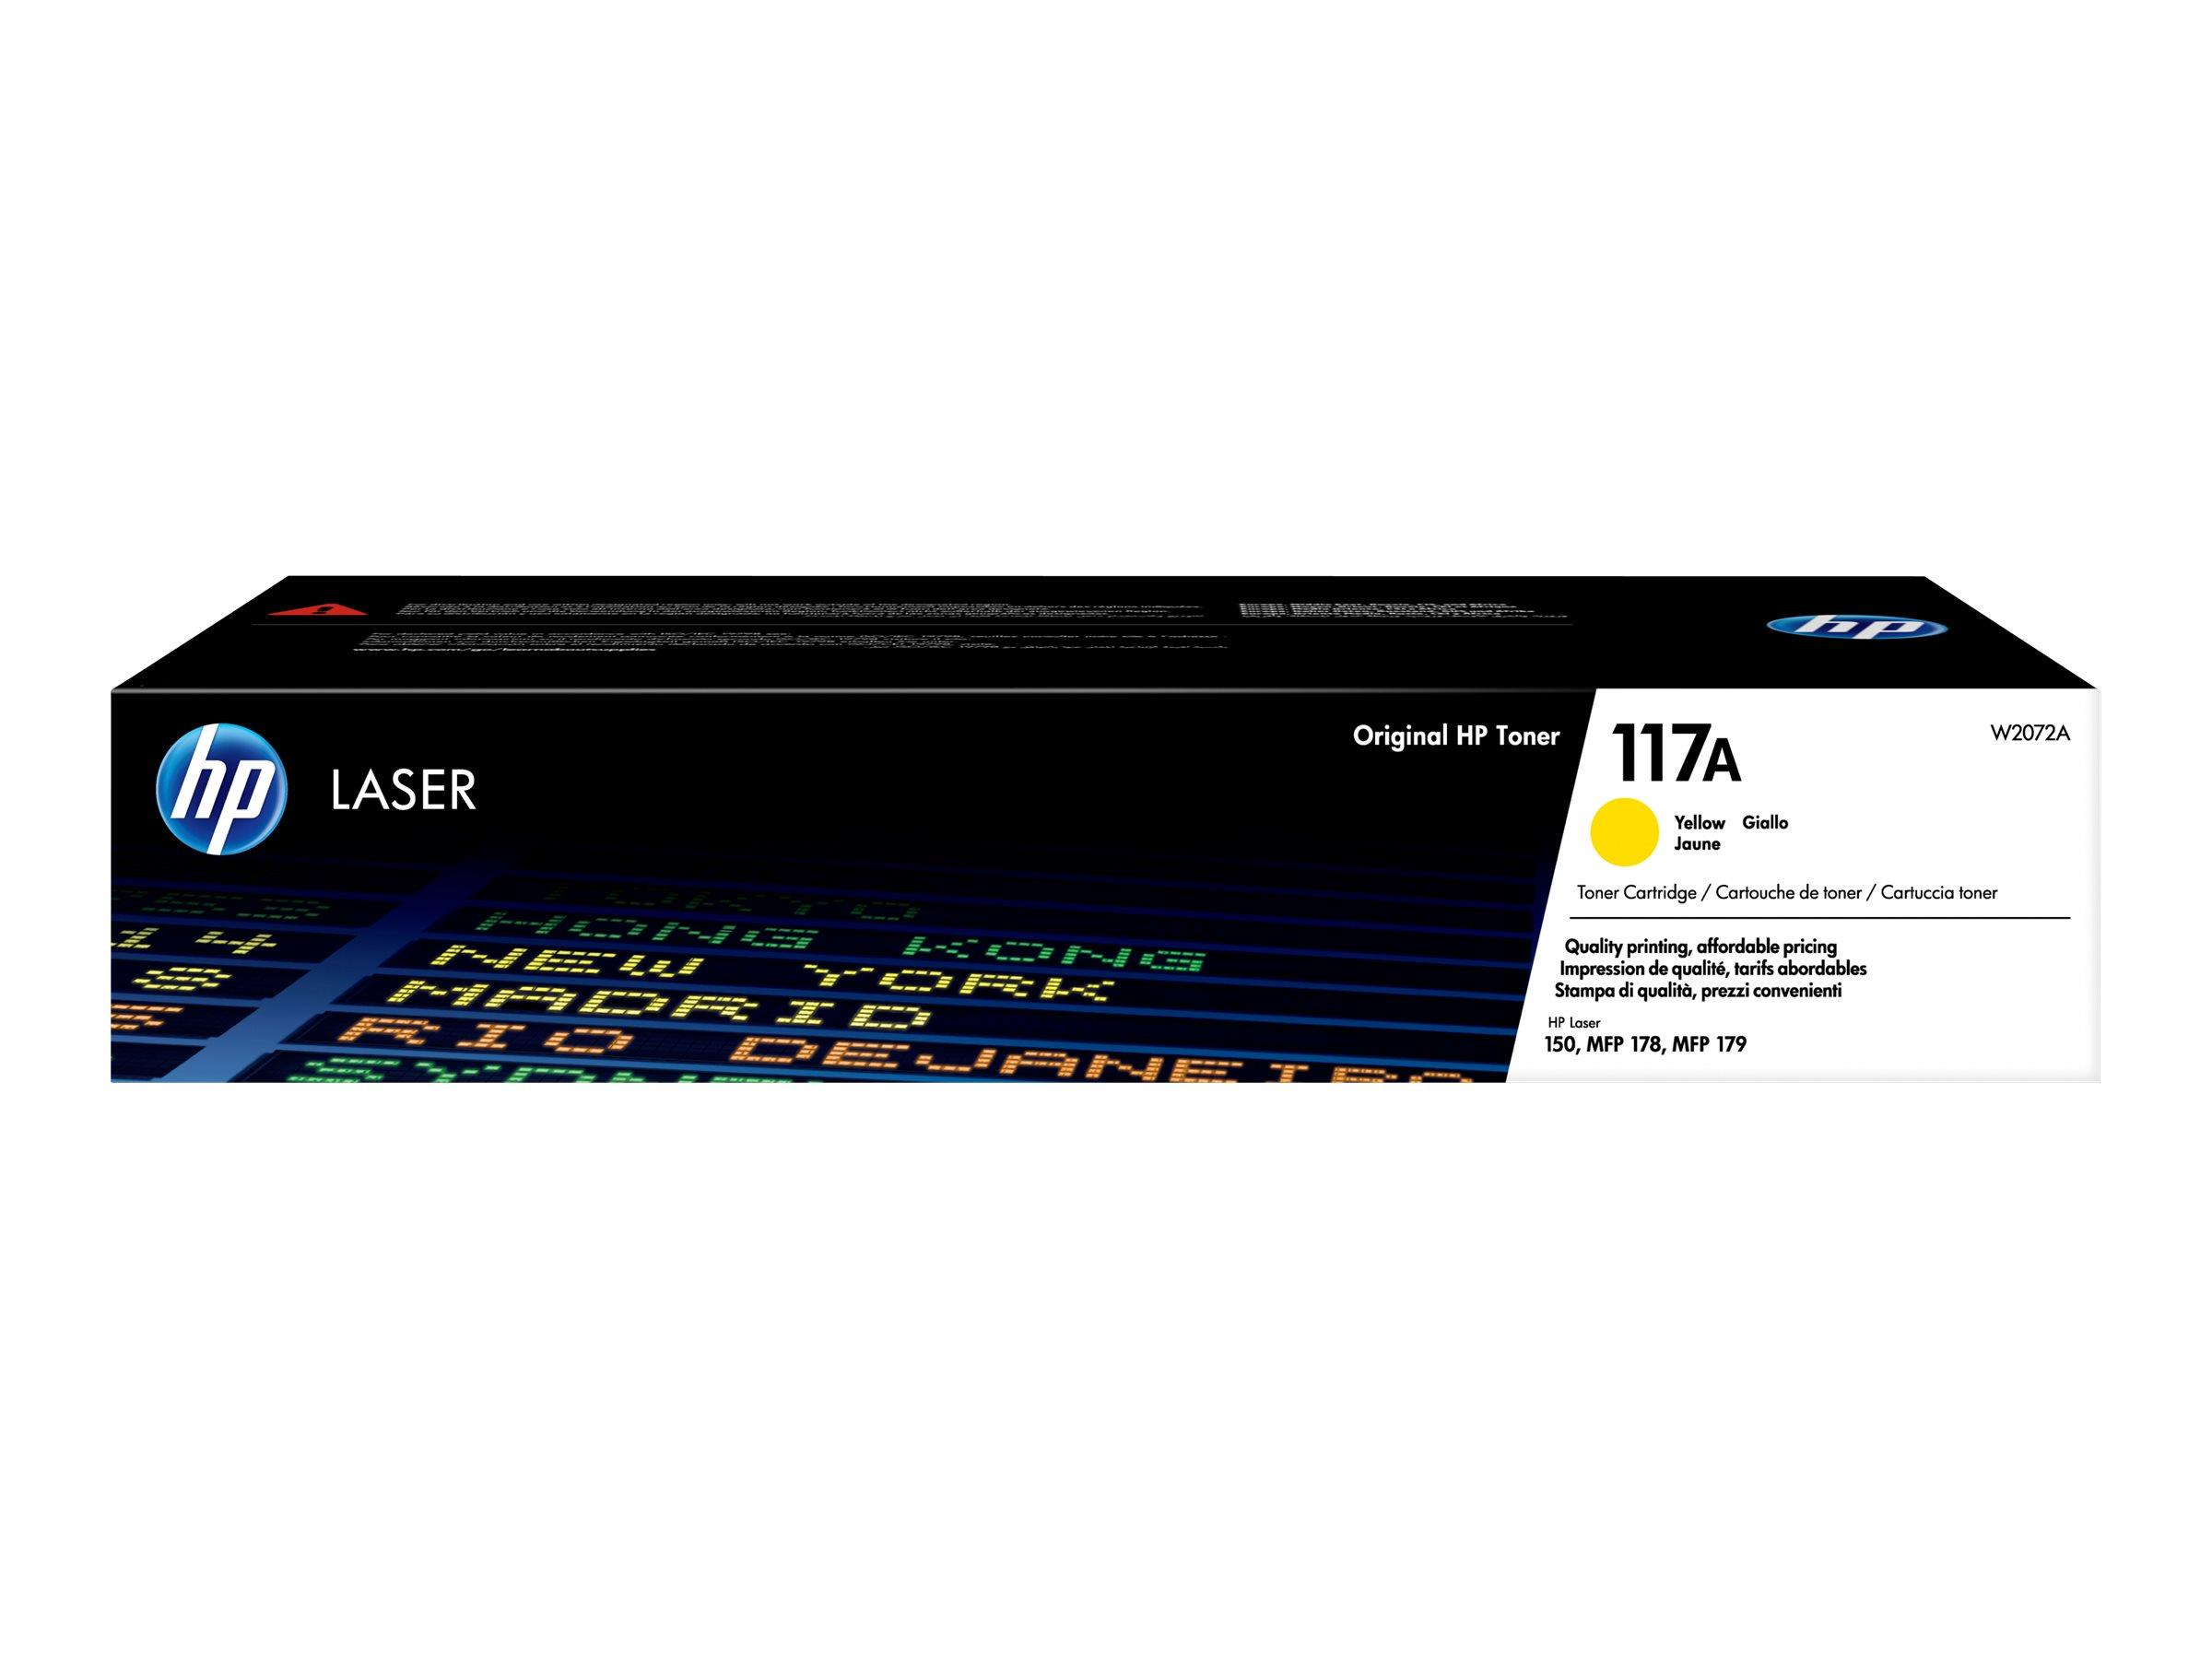 HP 117A Yellow Laser Toner Cartridge